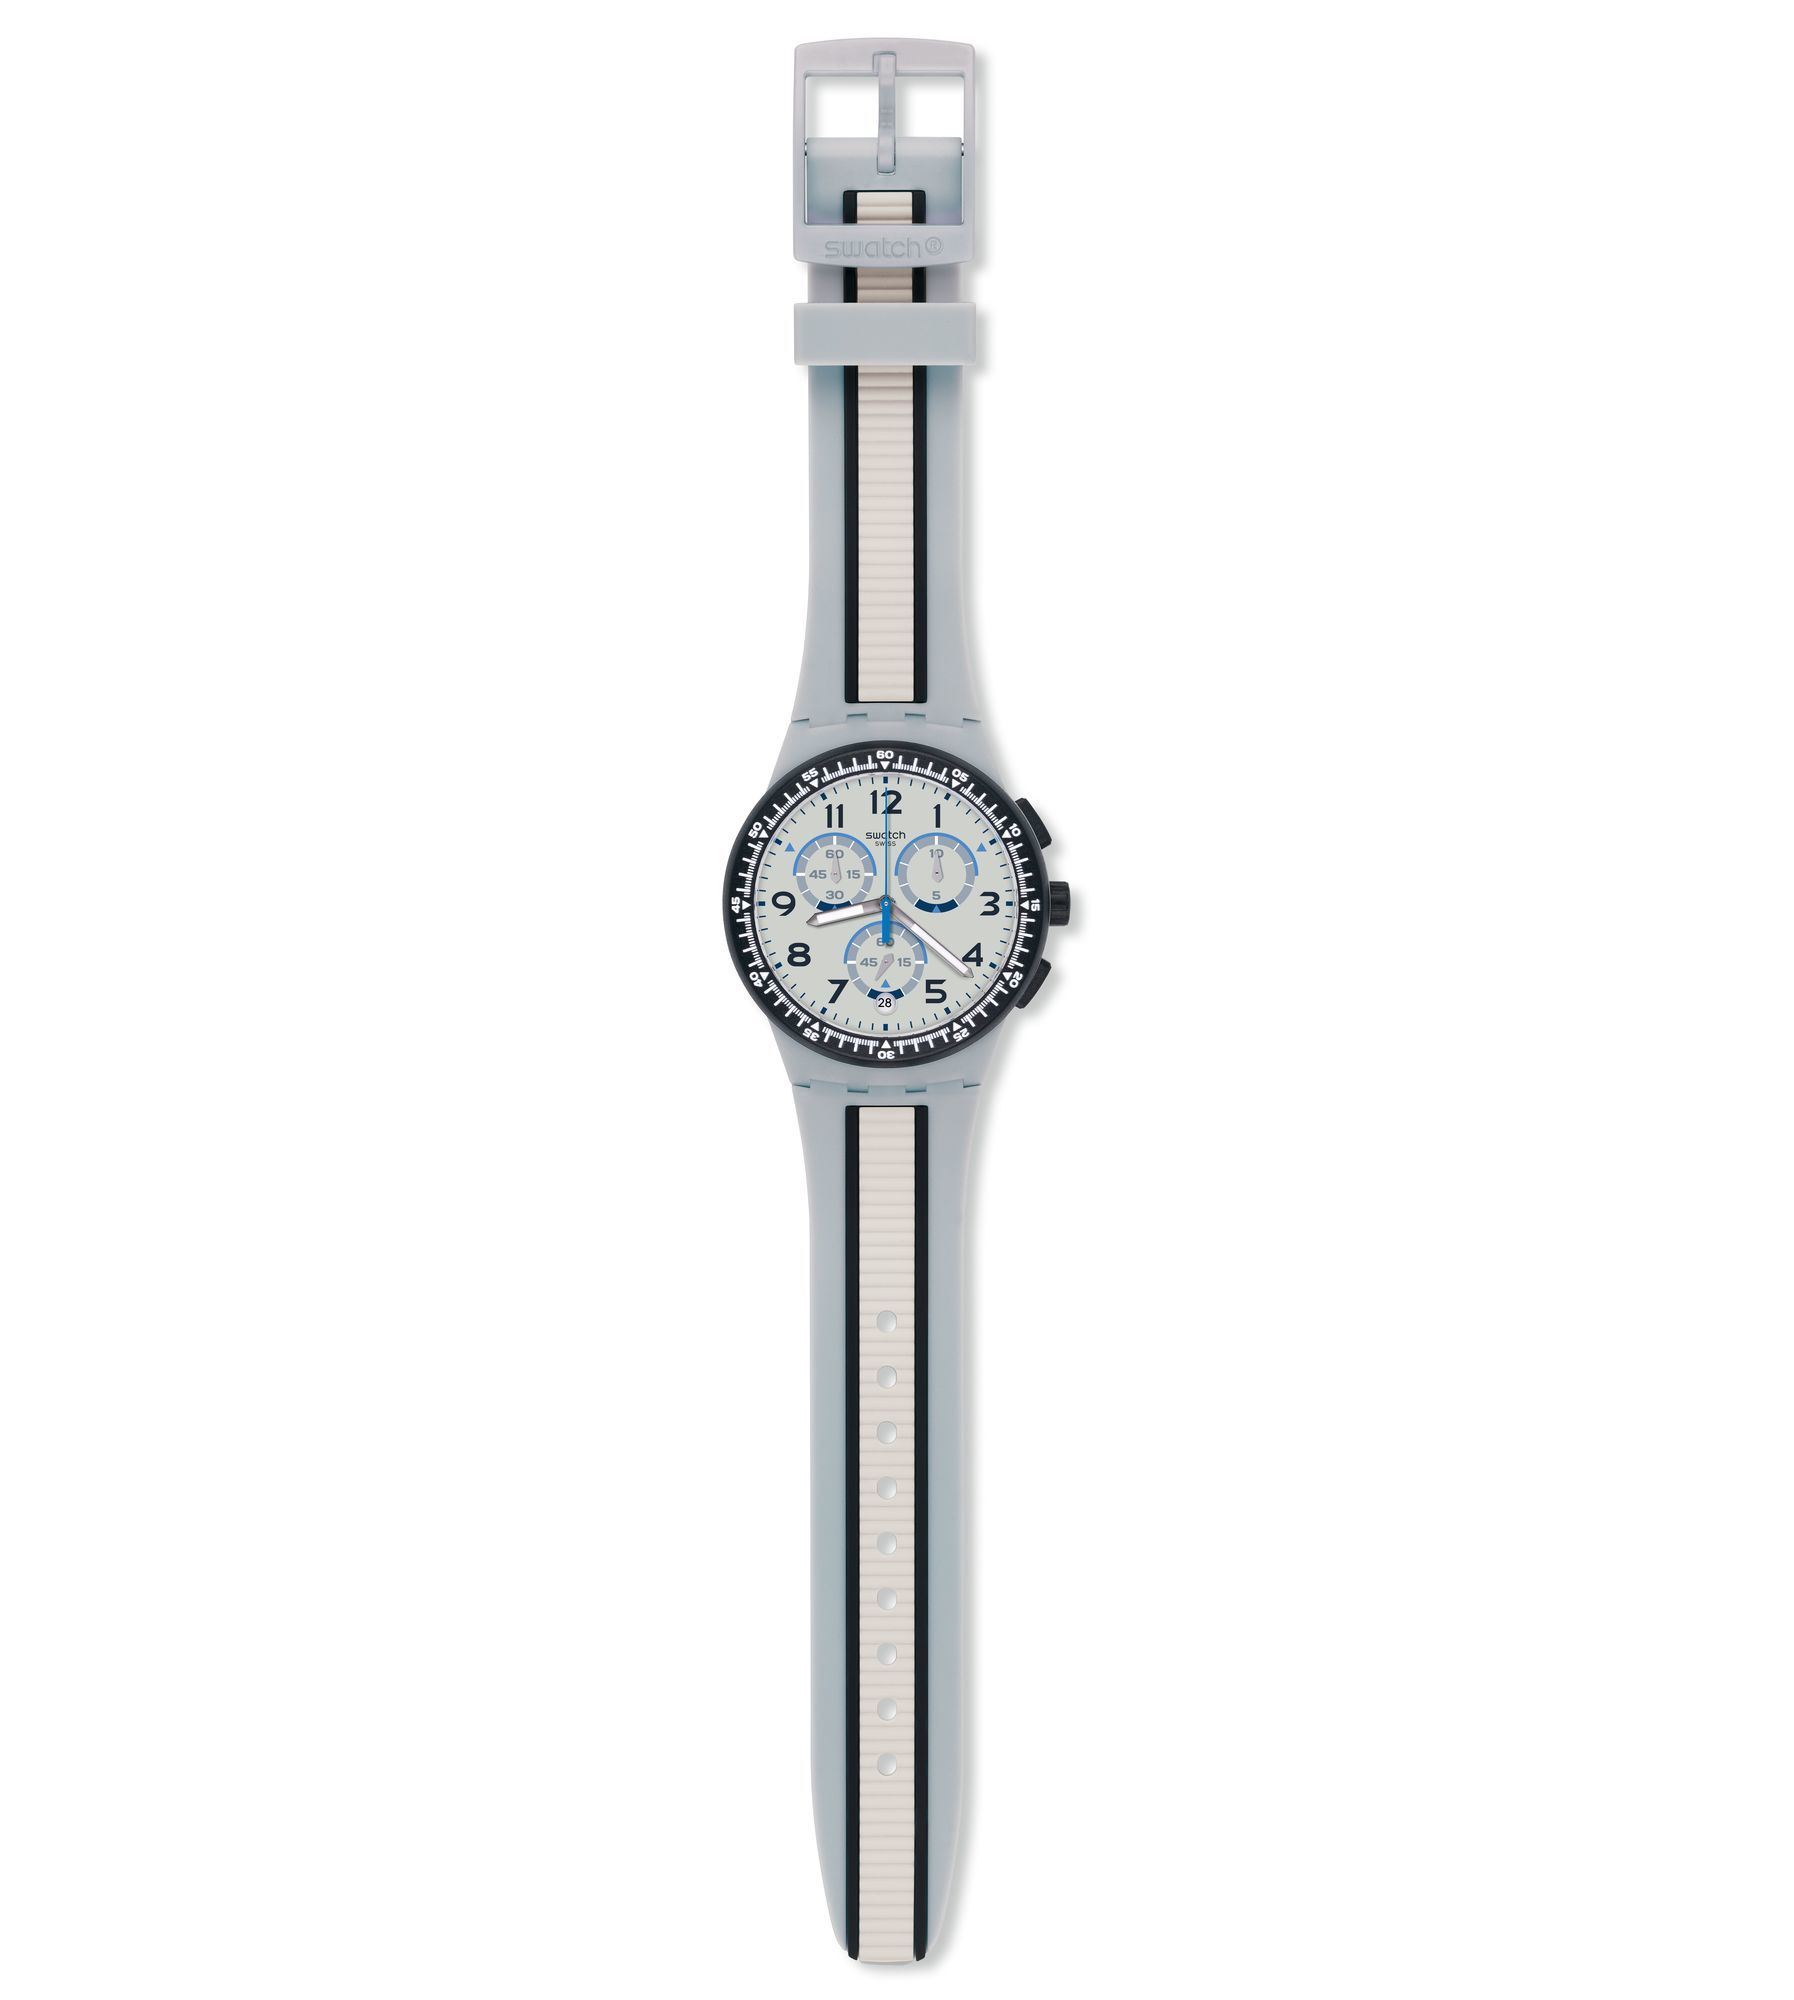 f9dca4274ef Swatch® Portugal - Chrono (Ø 42MM) MIRKOLINO SUSS401